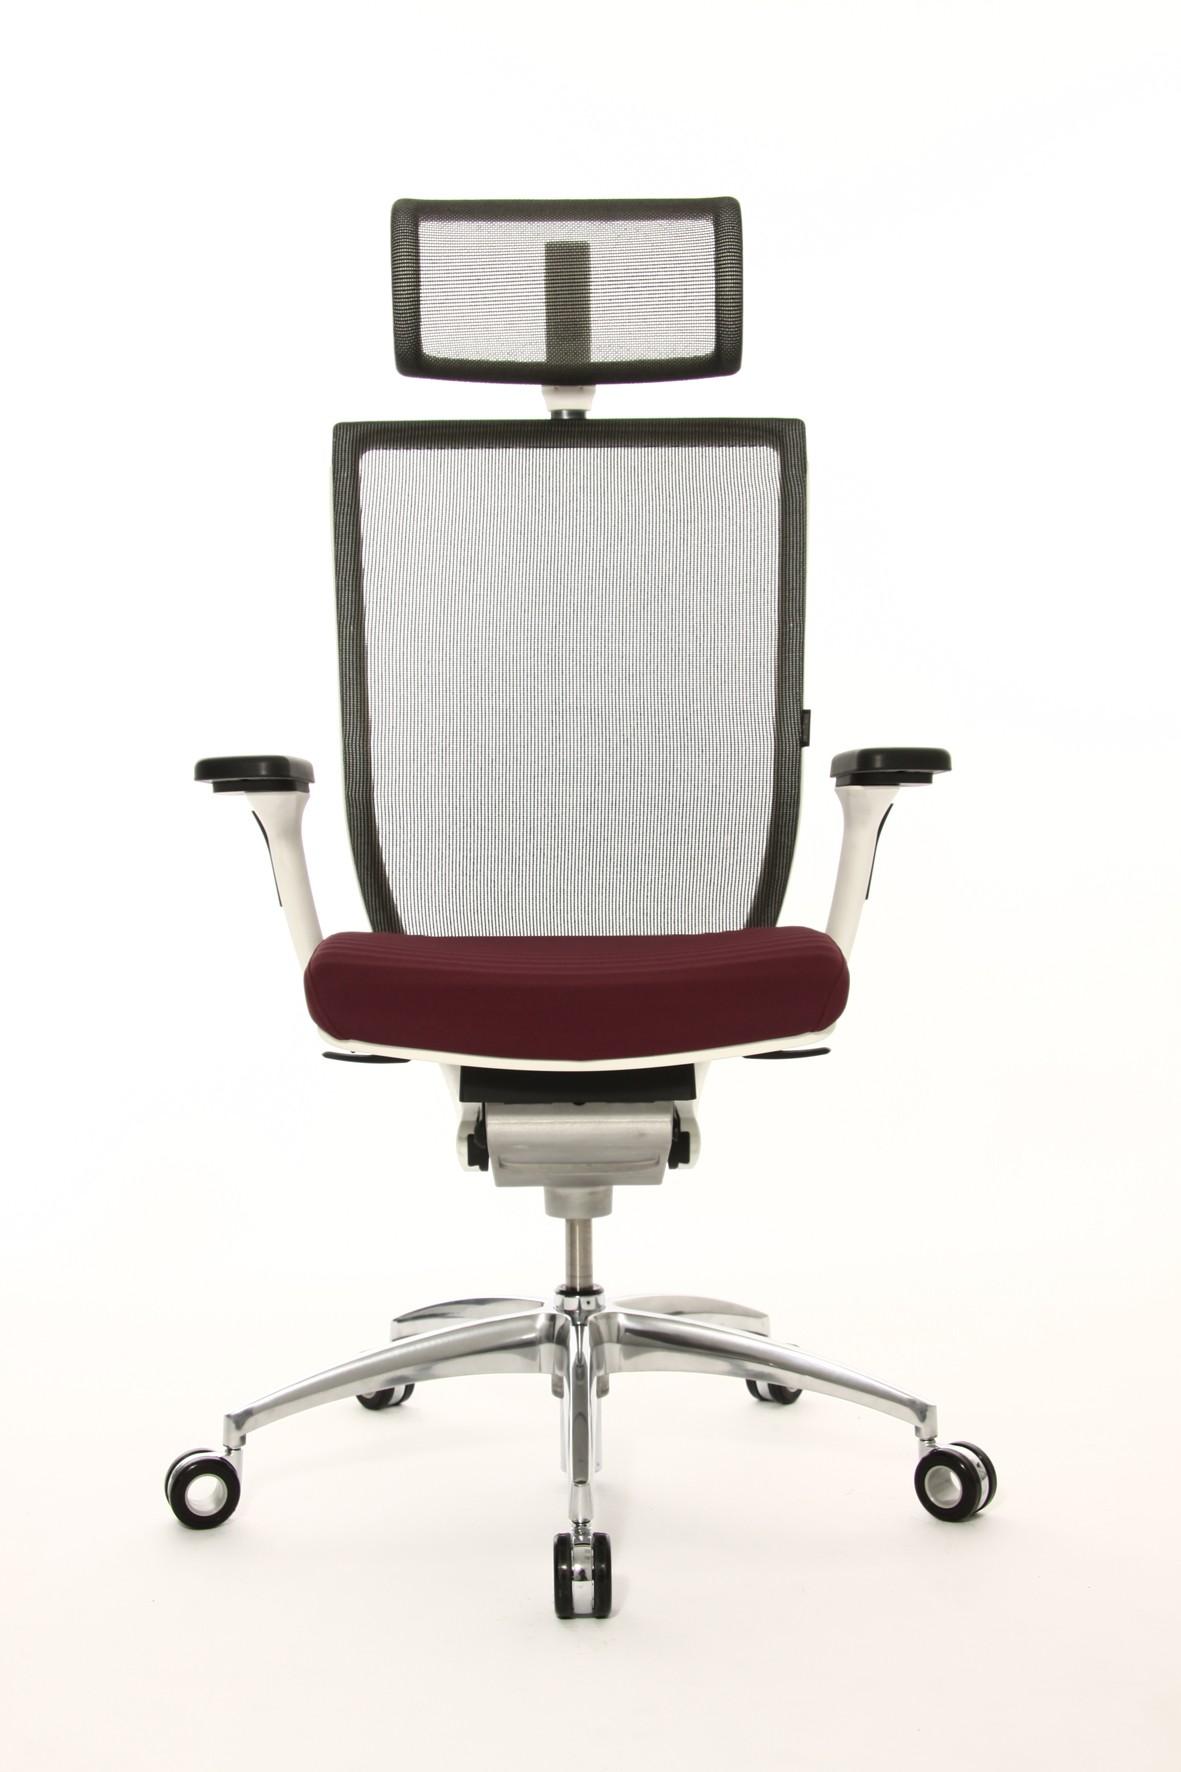 fauteuil de bureau haut de gamme. Black Bedroom Furniture Sets. Home Design Ideas